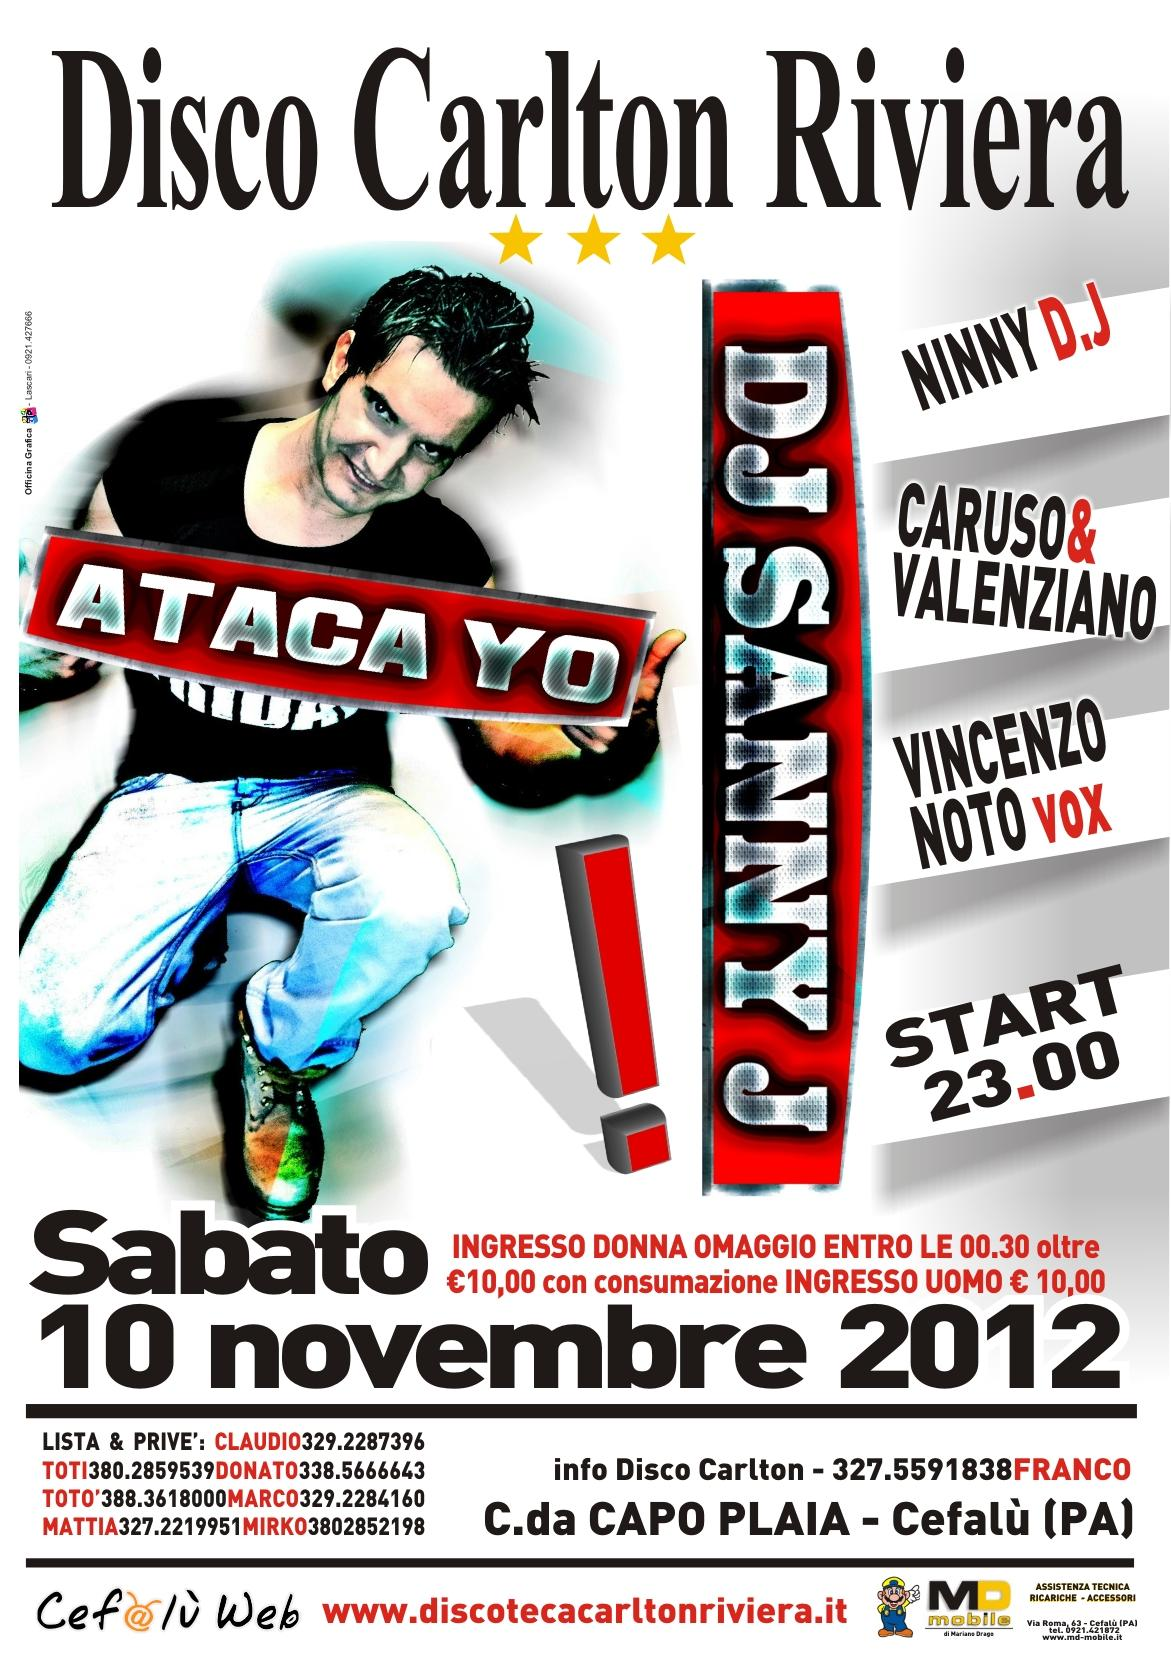 Discoteca Carlton Riviera: 3 Novembre 2012 – Dj Sanny J (Alegria)